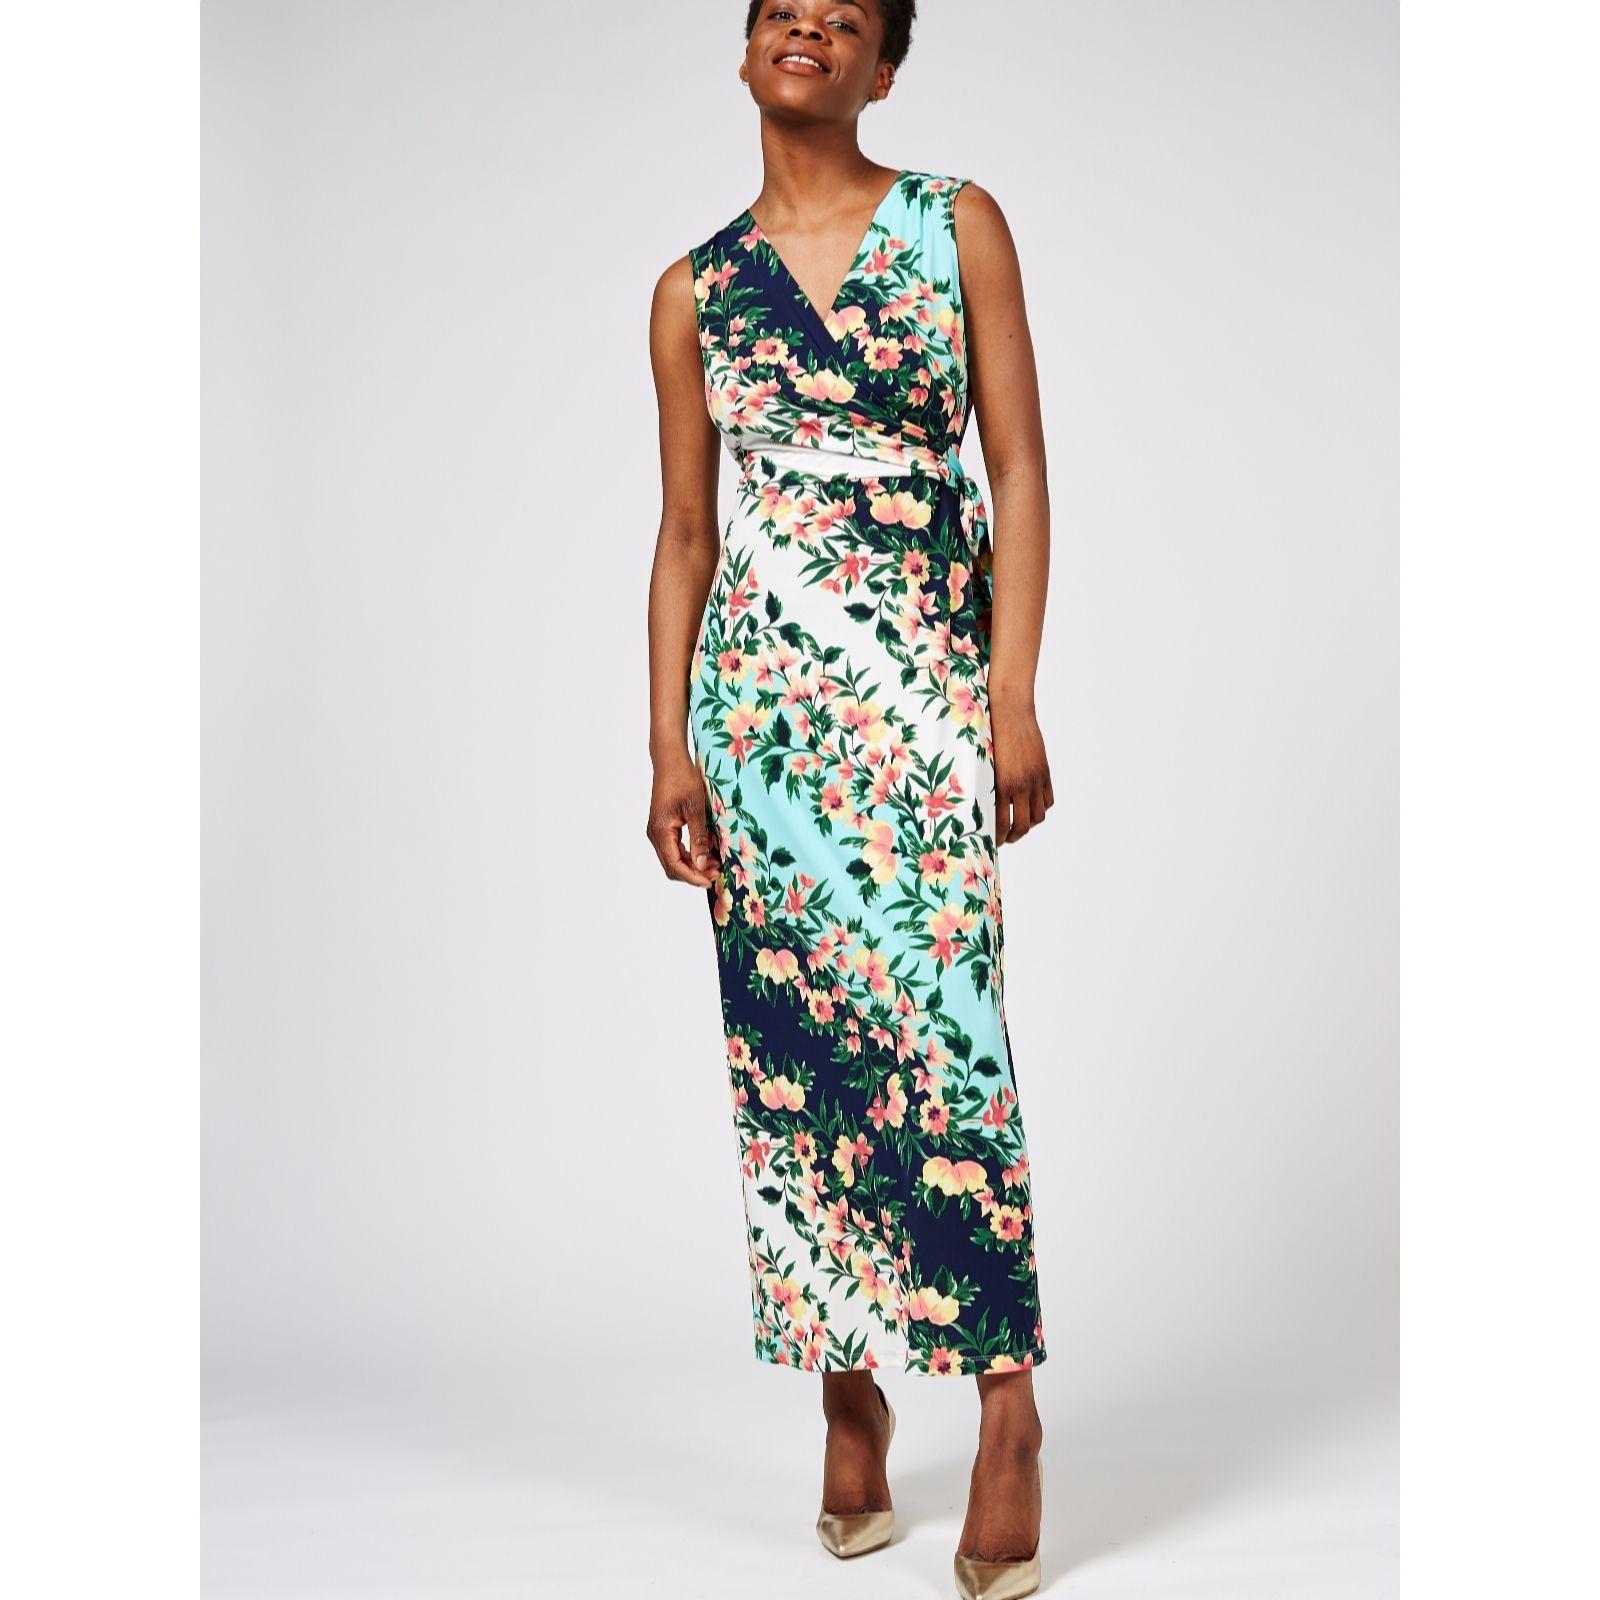 9569fc4faf5 Sleeveless Printed Maxi Dress with Keyhole Detail by Nina Leonard ...